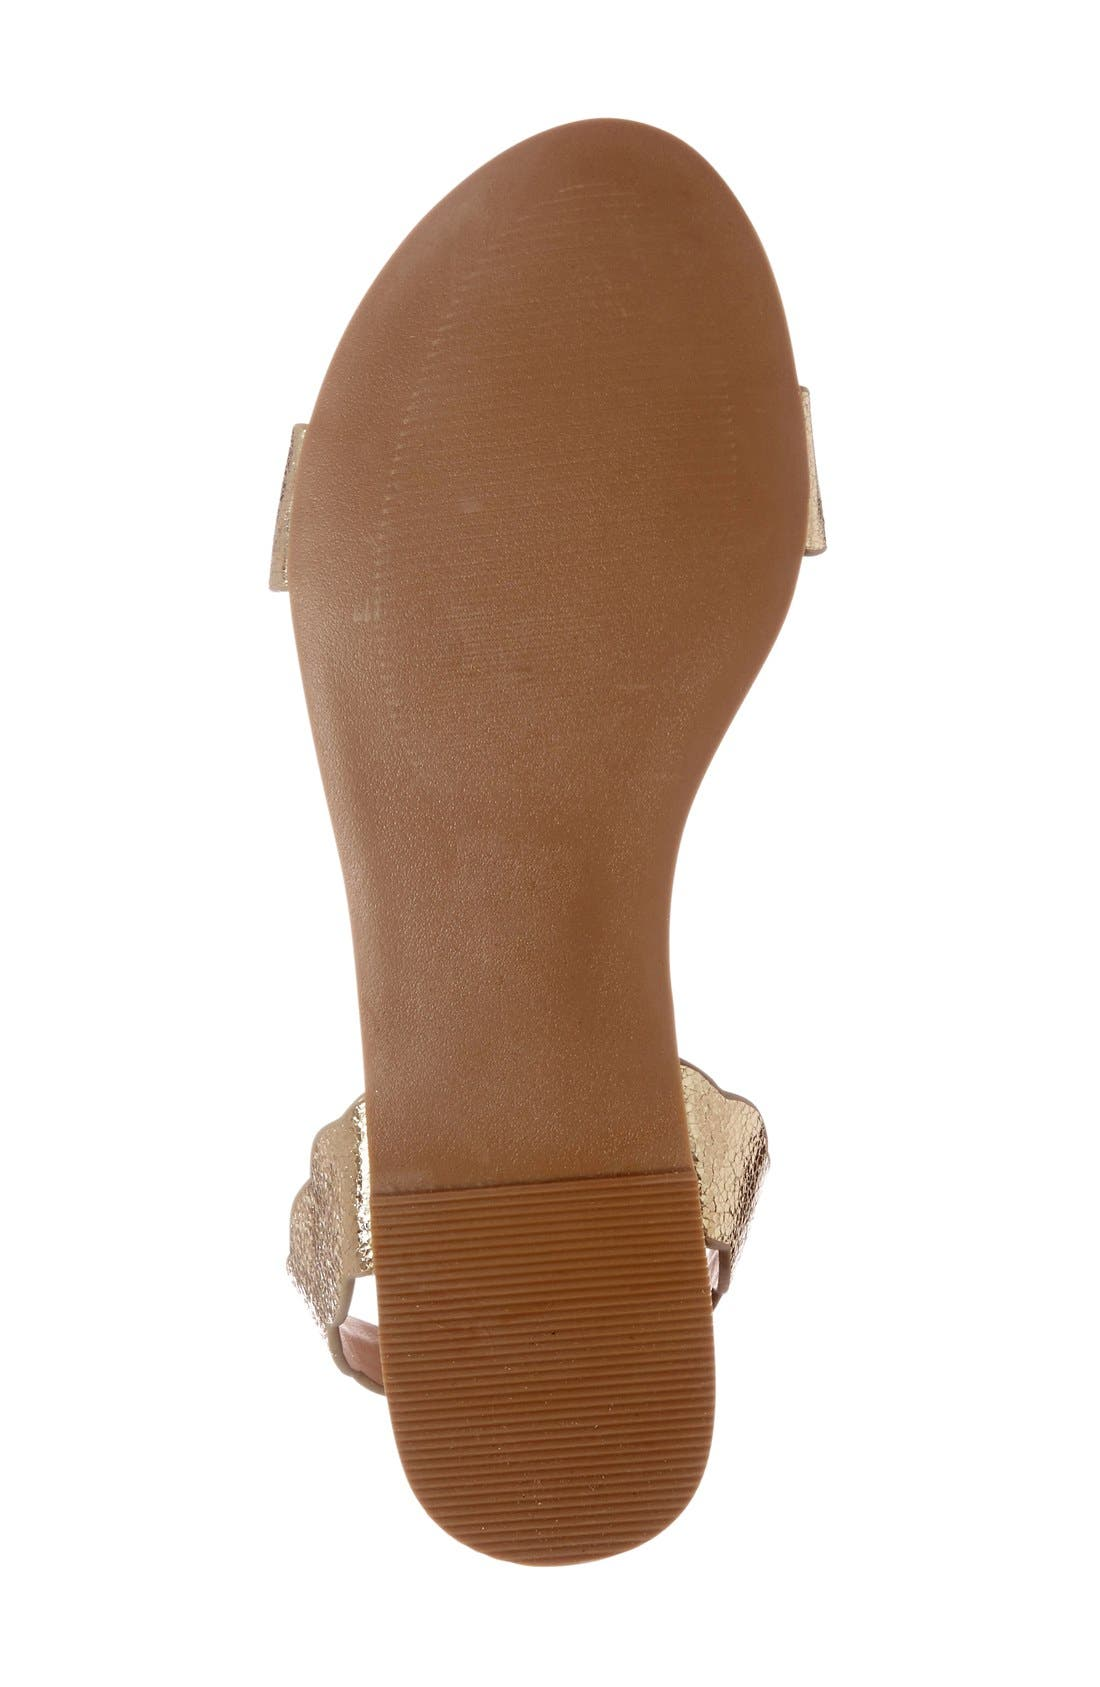 'Odette' Scalloped Ankle Strap Flat Sandal,                             Alternate thumbnail 21, color,